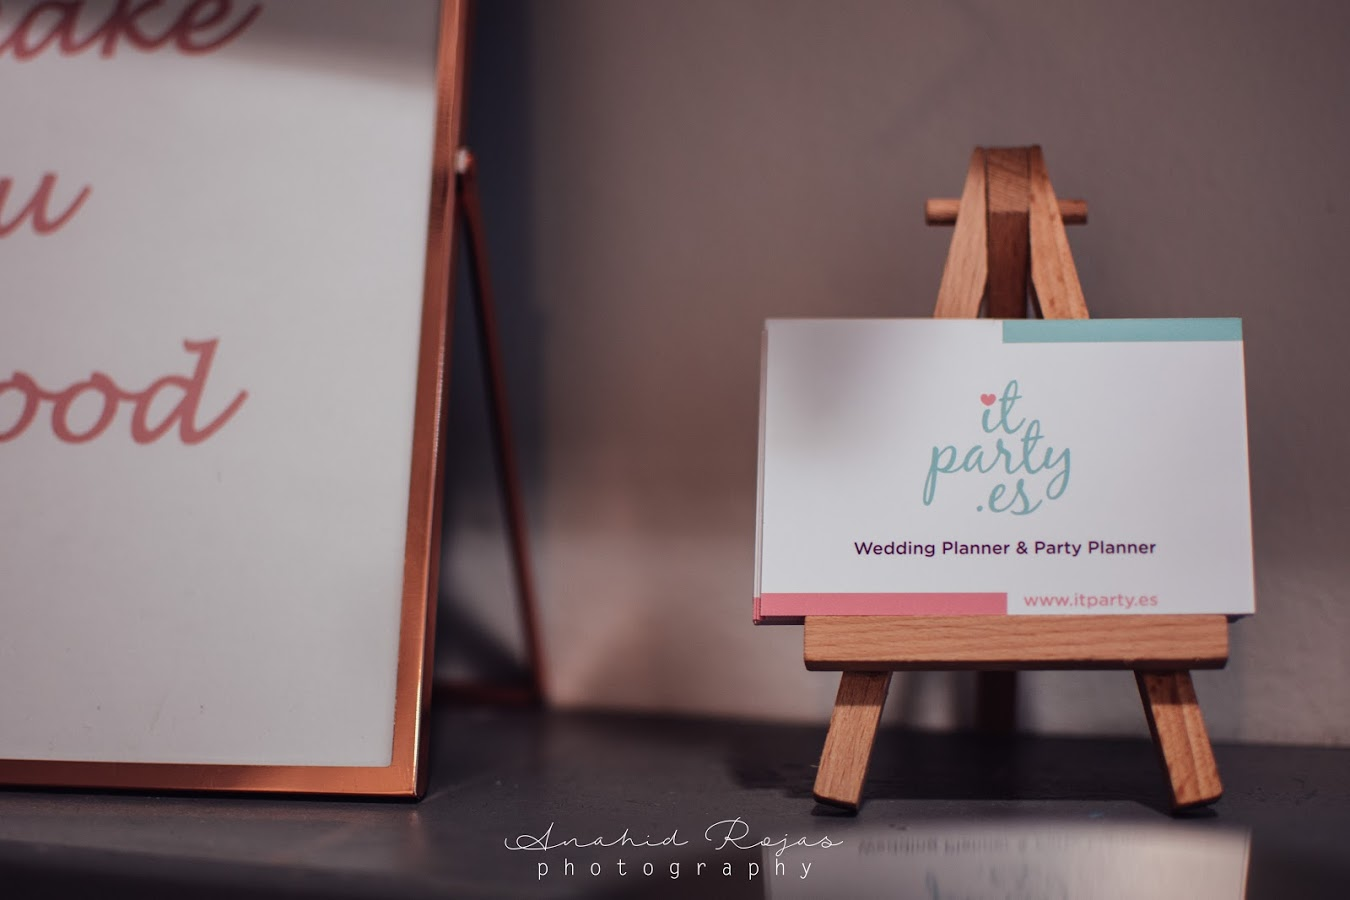 tarjeta visita it party